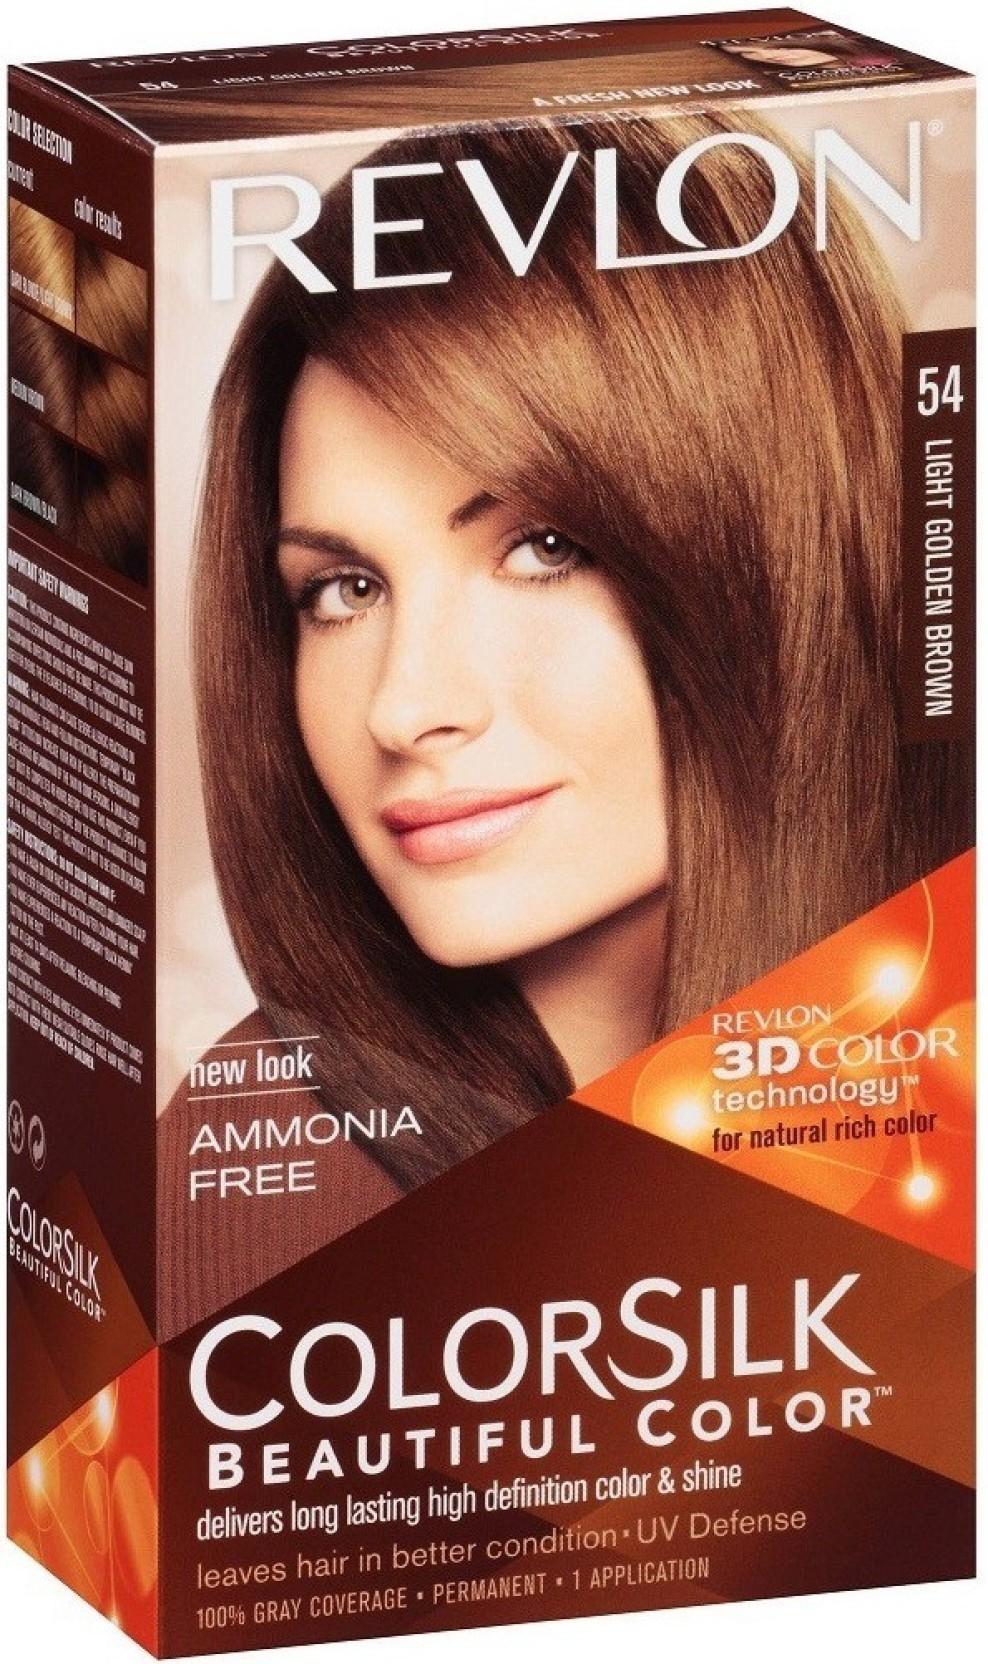 Revlon Light Golden Brown No 54 Hair Color Price In India Buy